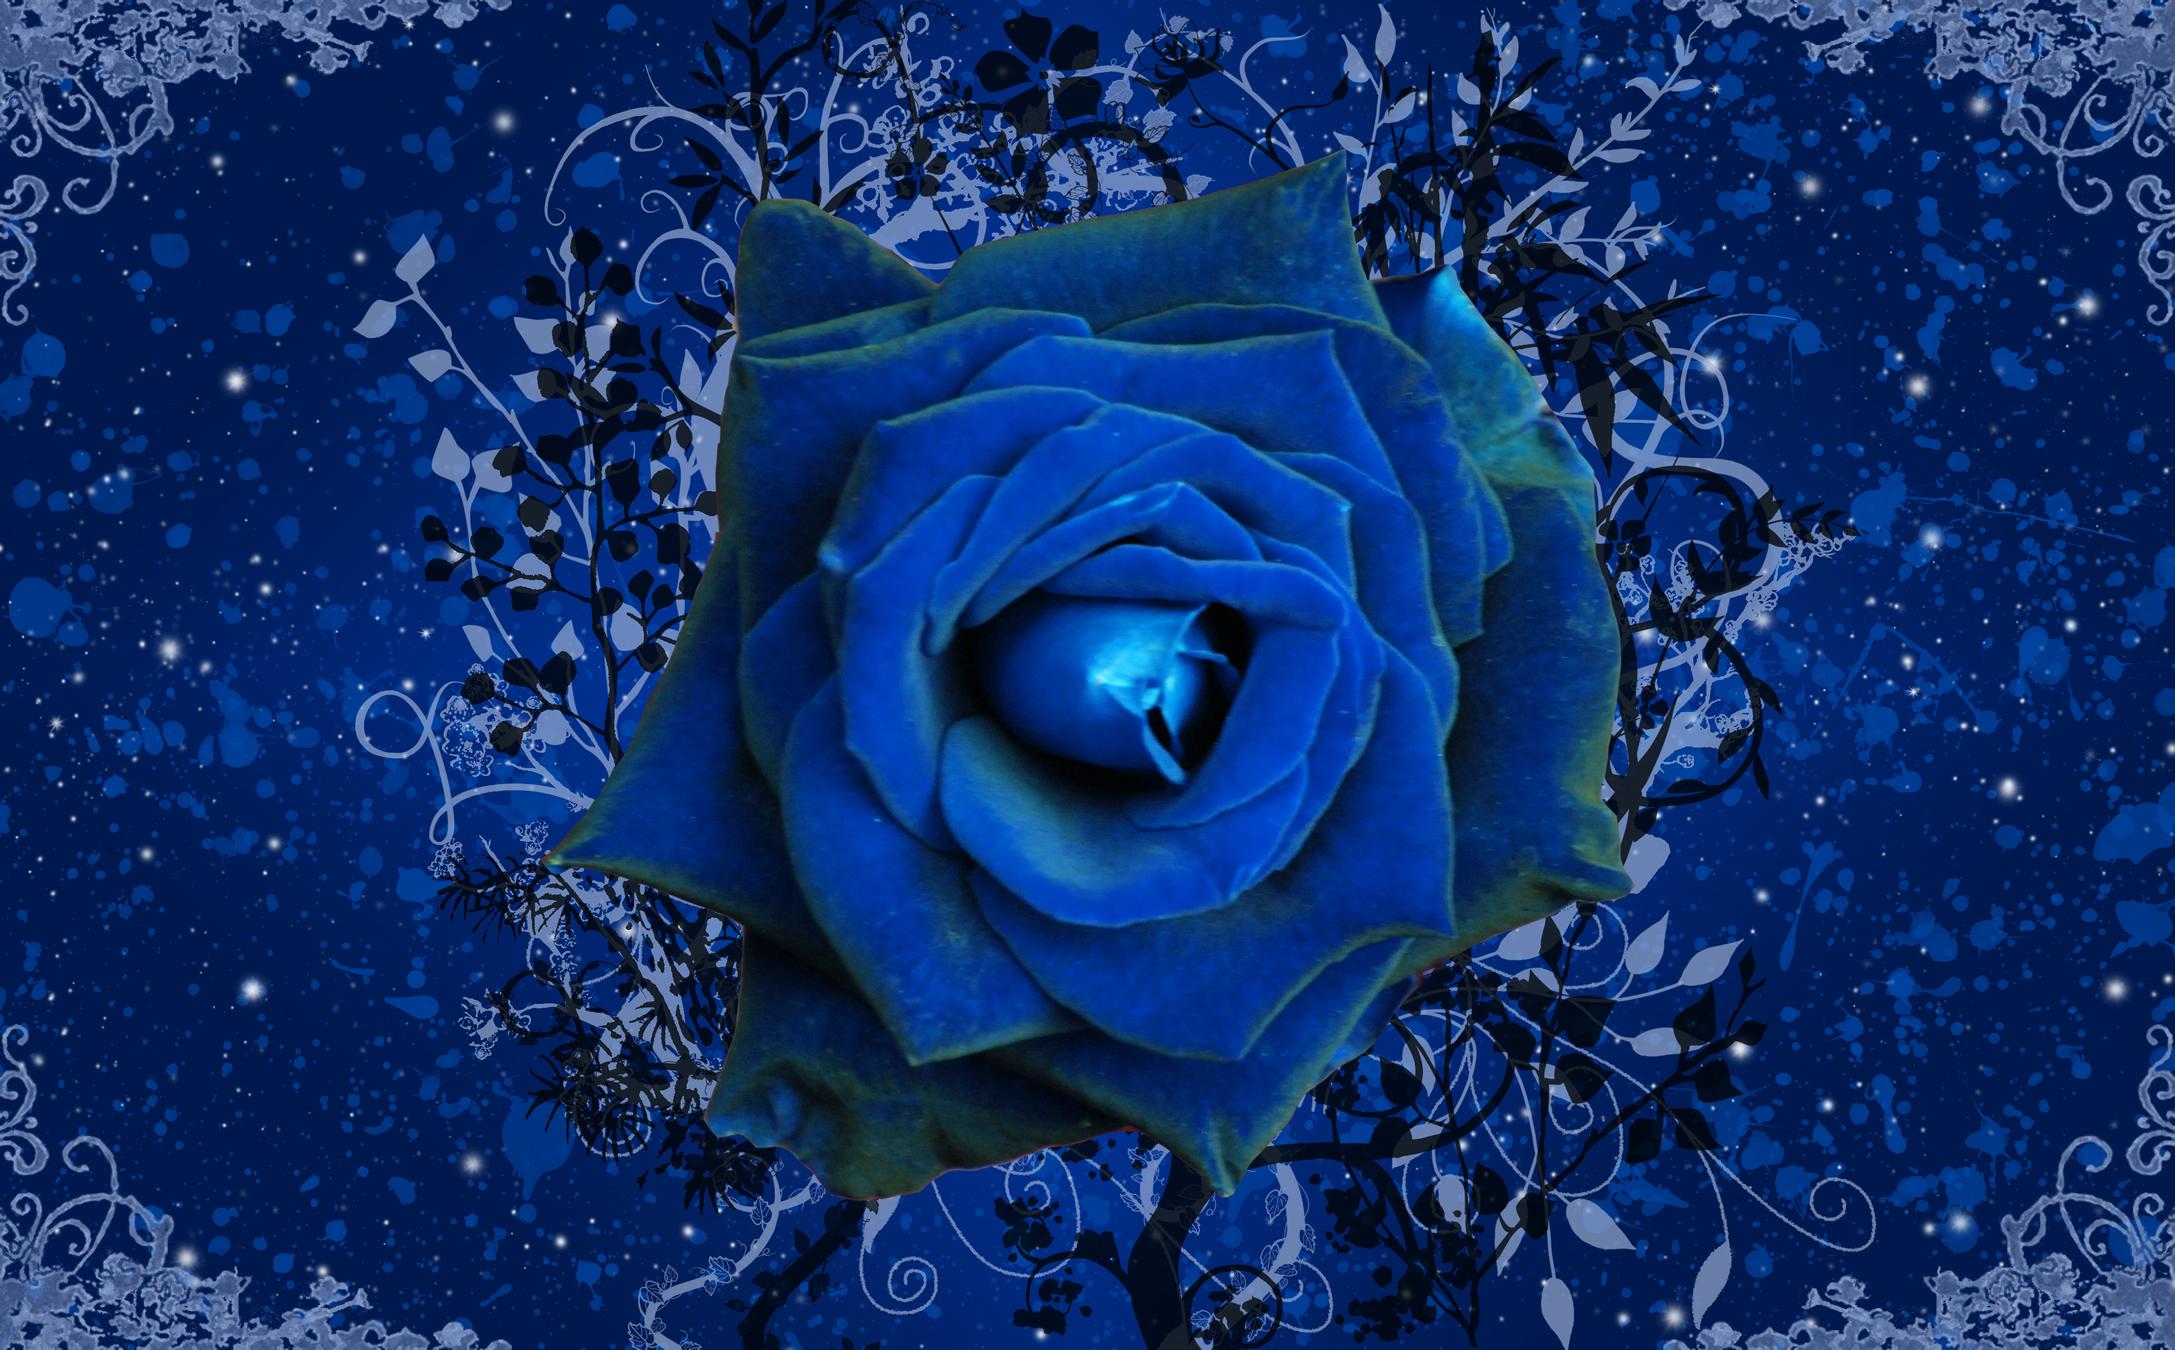 Картинки синие мокасины - 47810